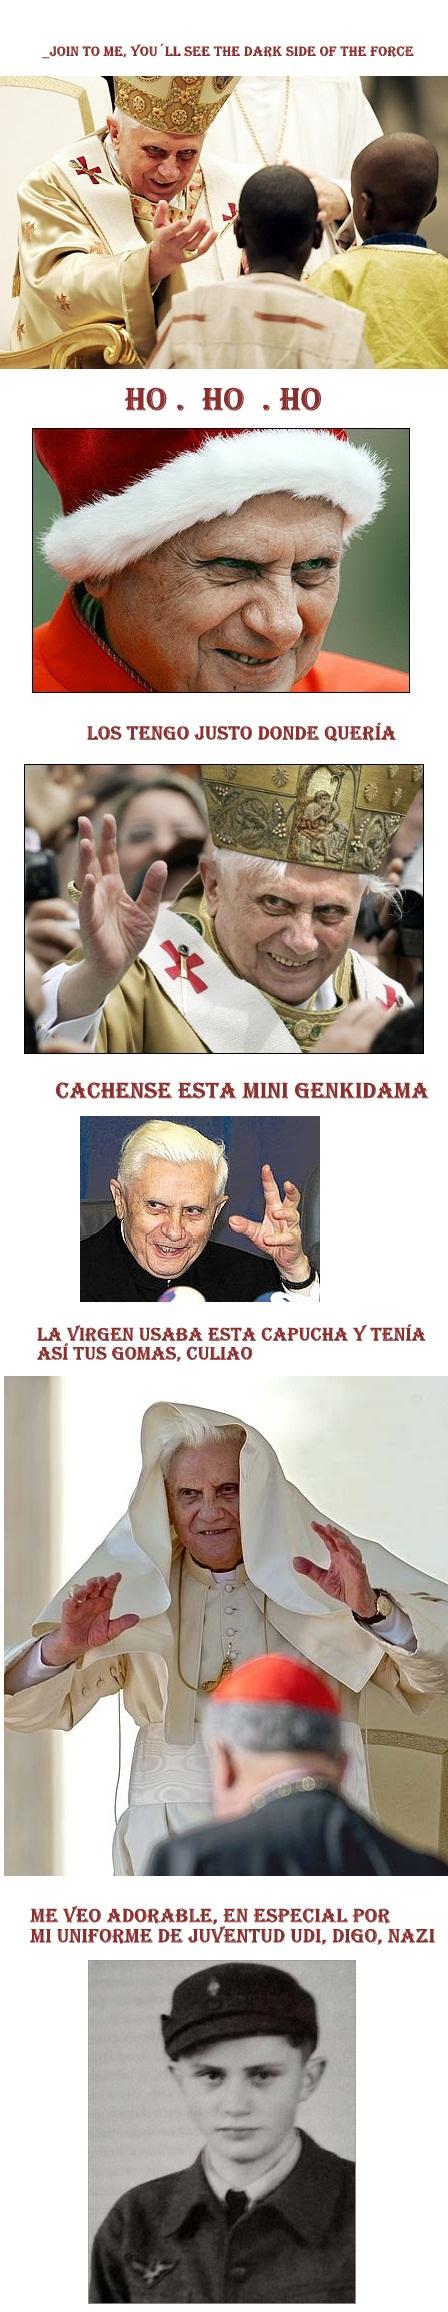 pope 1